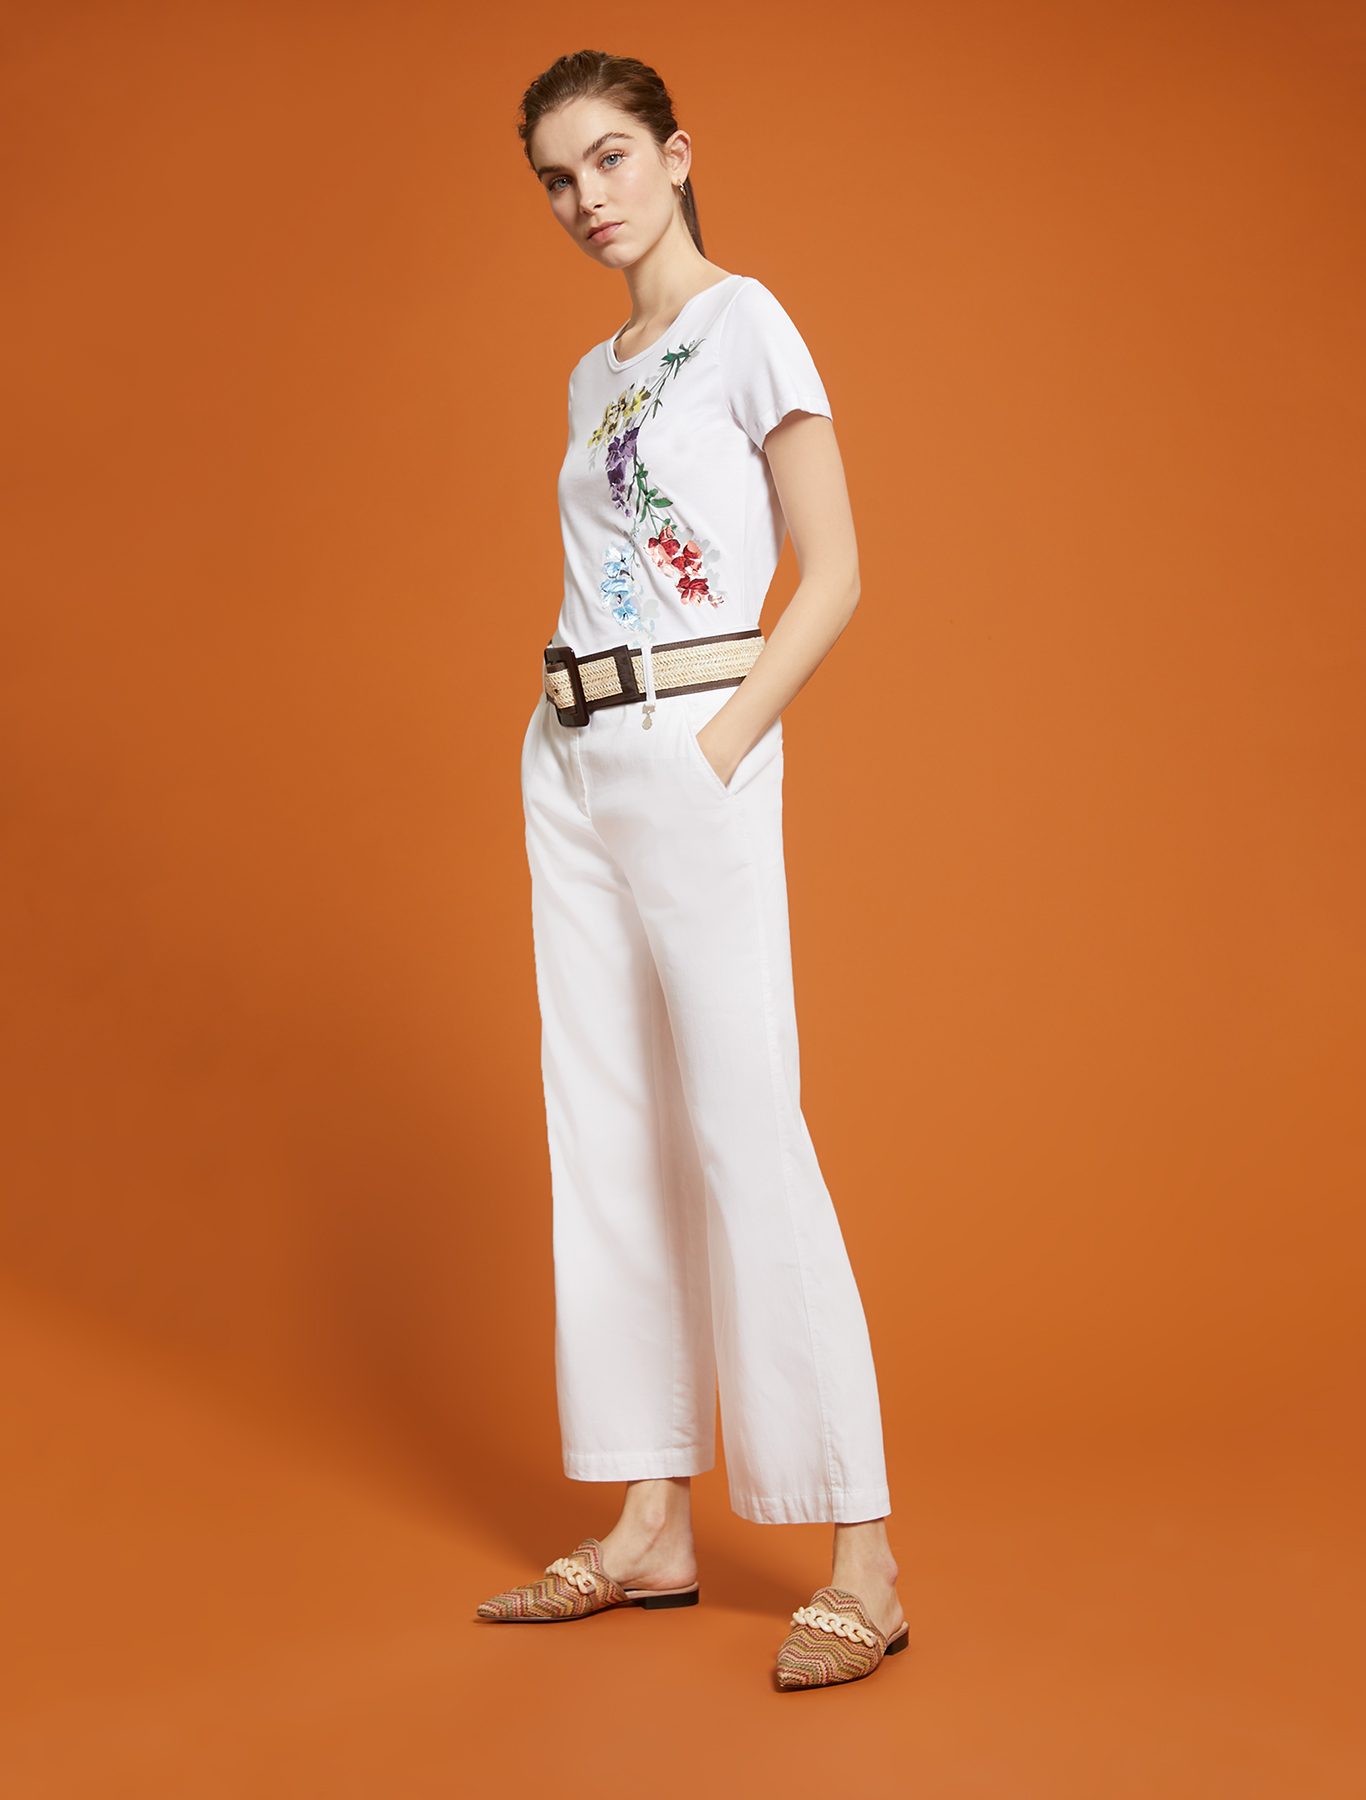 Floral ramage T-shirt - white - pennyblack